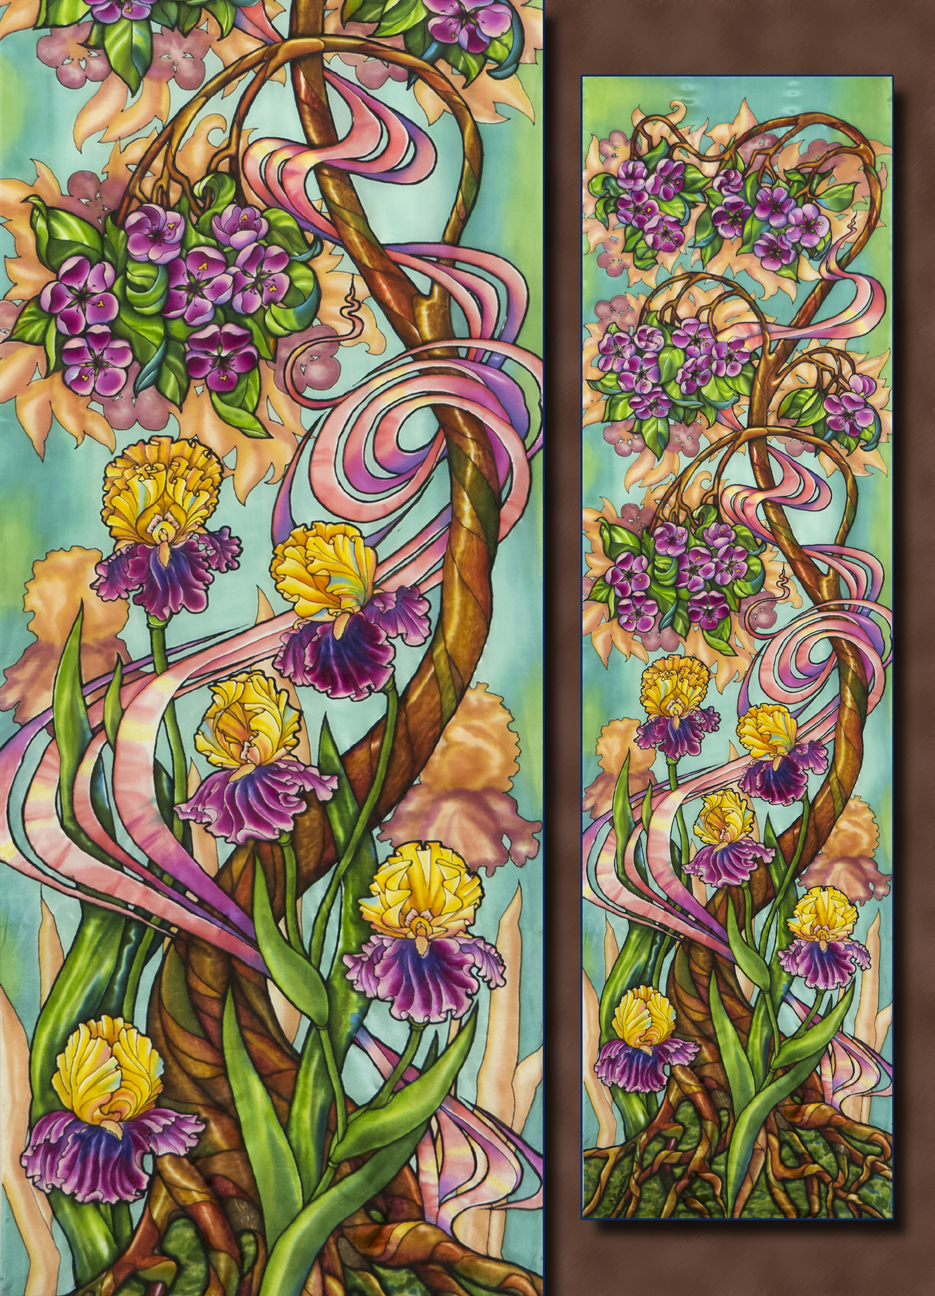 Blooming Tree and Irises